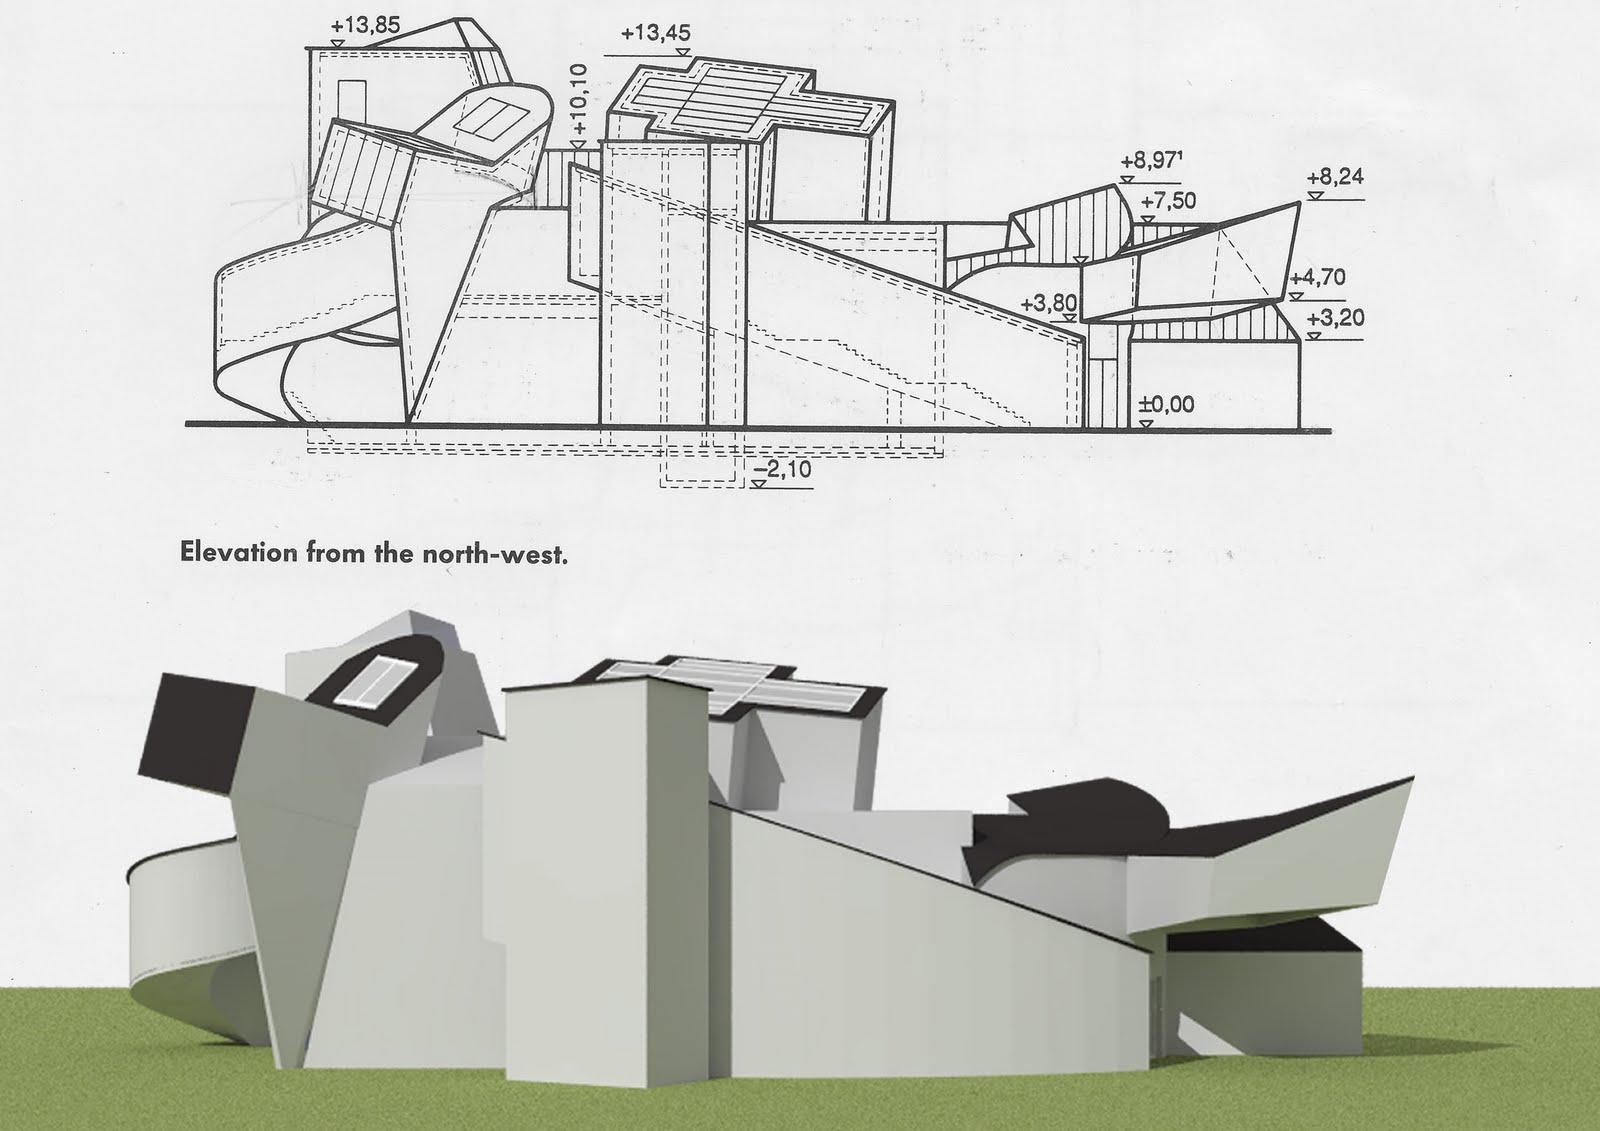 janu arch 1390 vitra design museum comparison. Black Bedroom Furniture Sets. Home Design Ideas